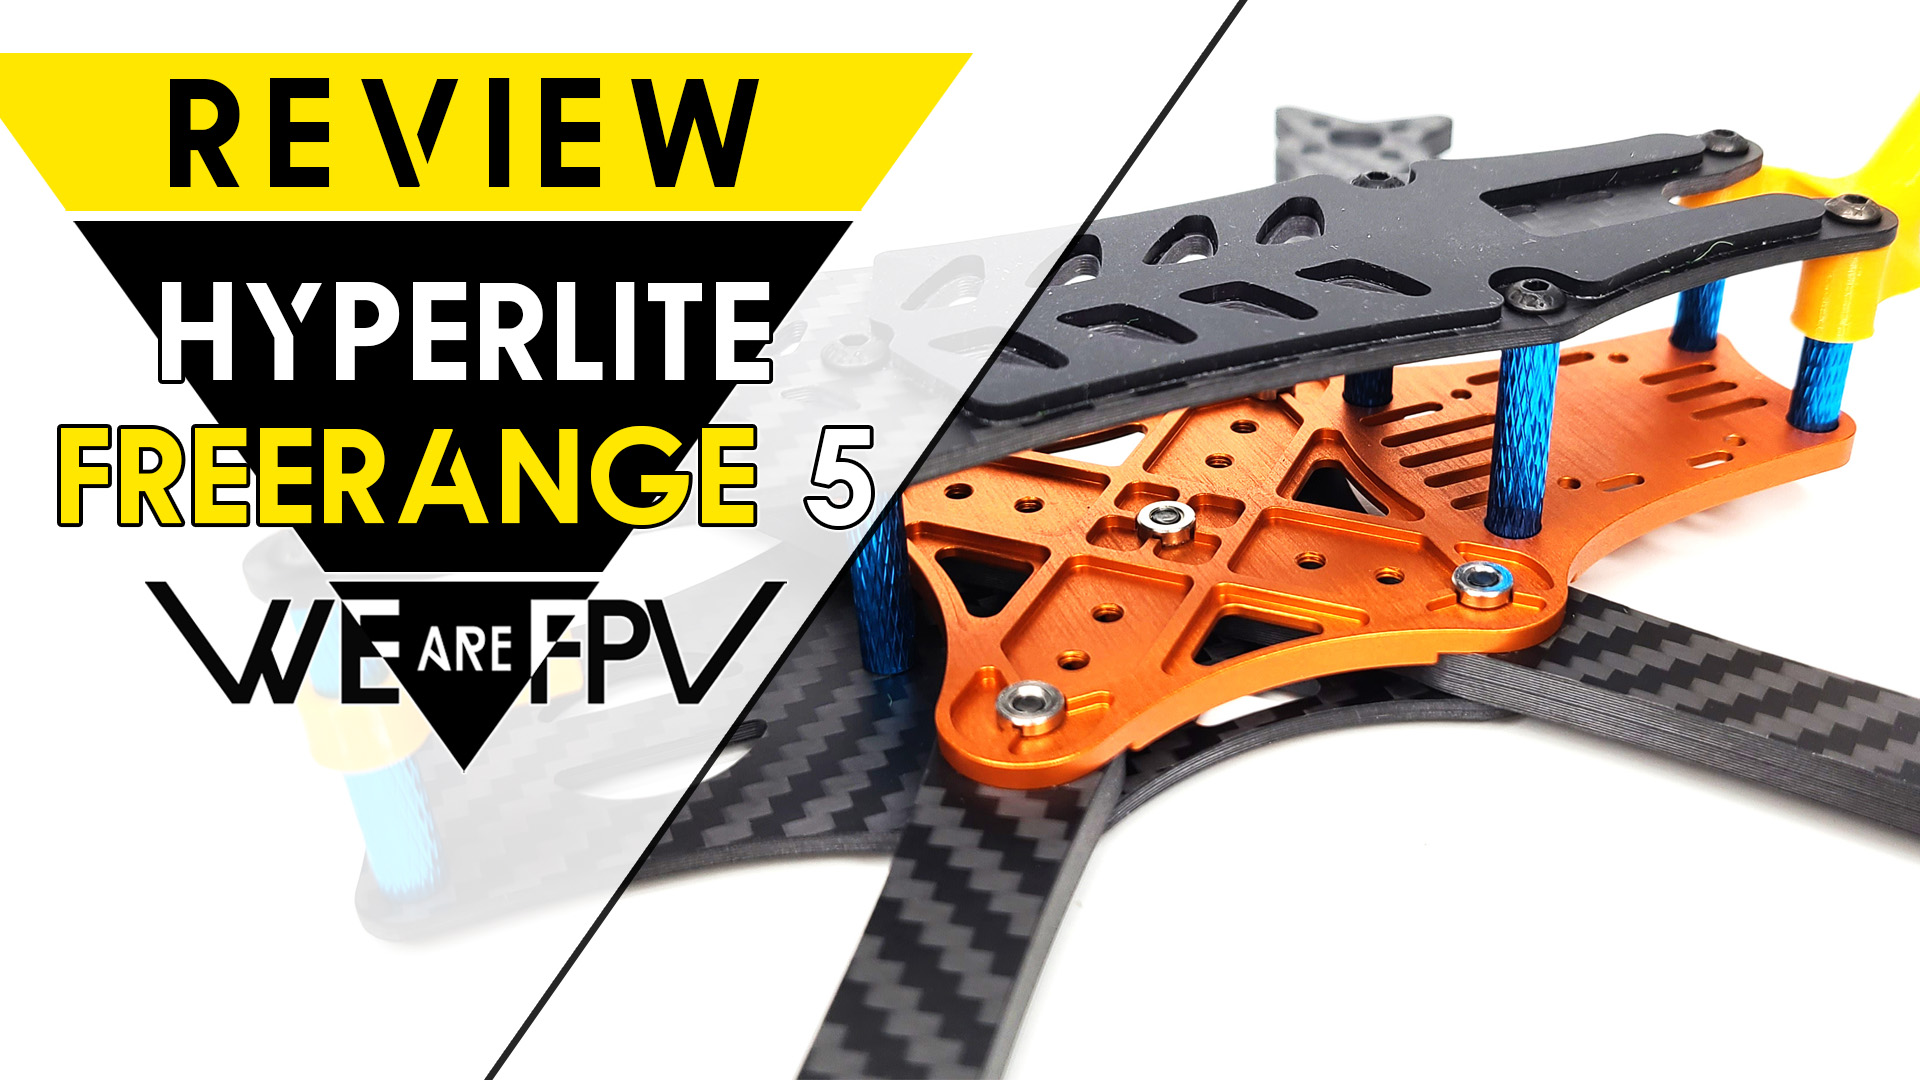 test hyperlite freerange hd review settings